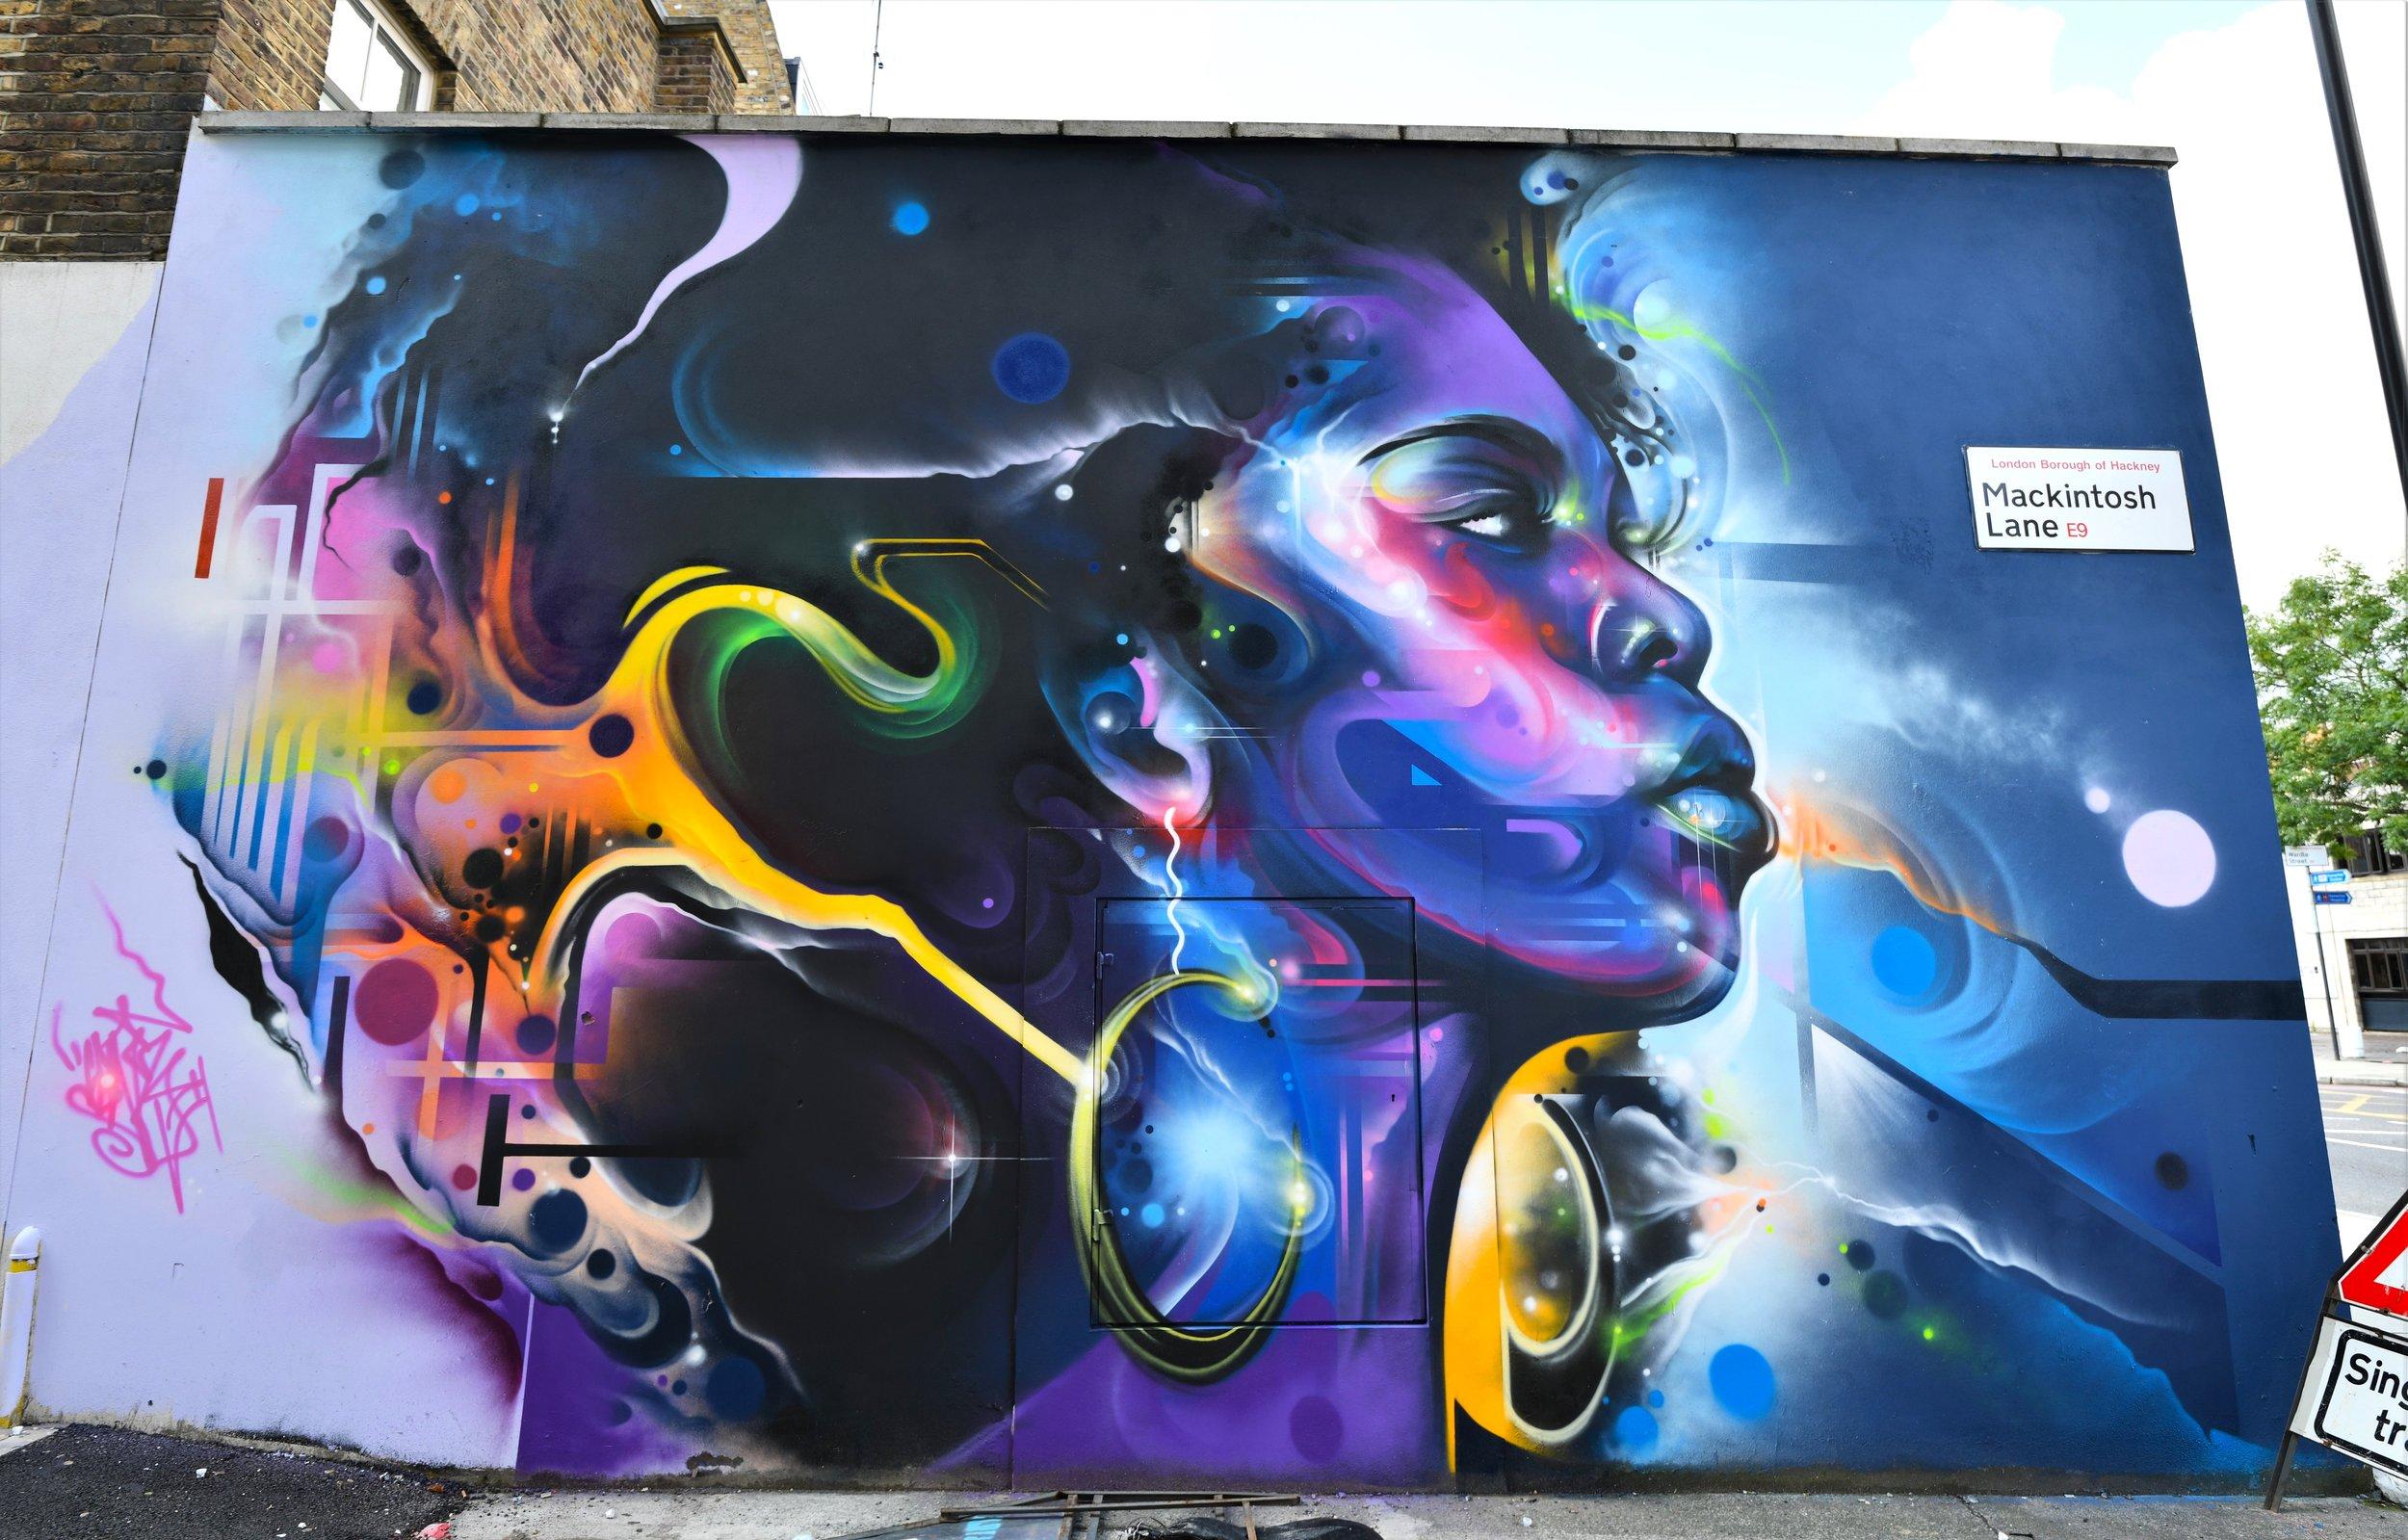 Hackney. London, 2019